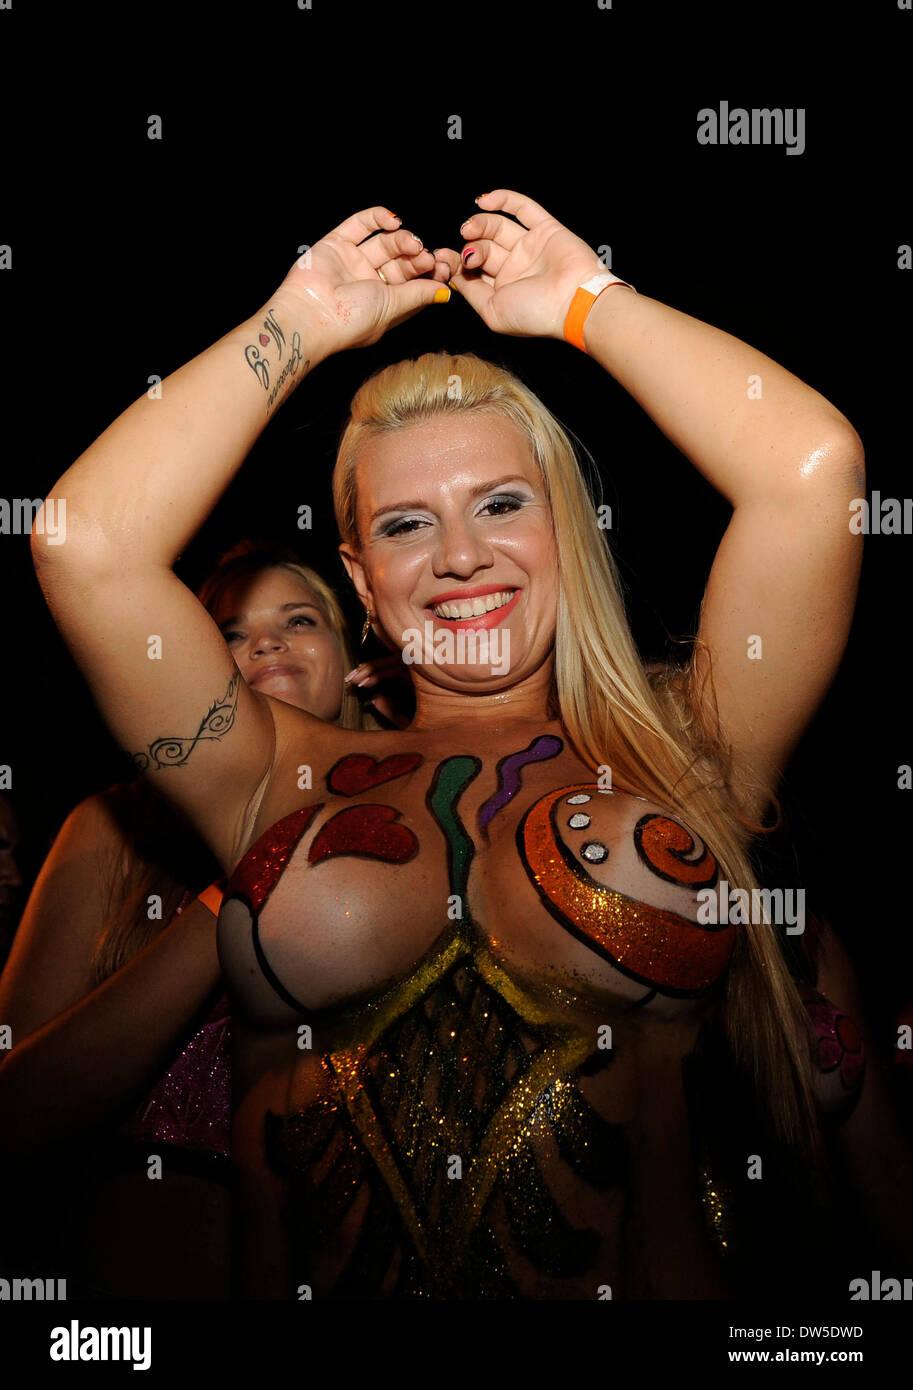 Melissa bishop nude